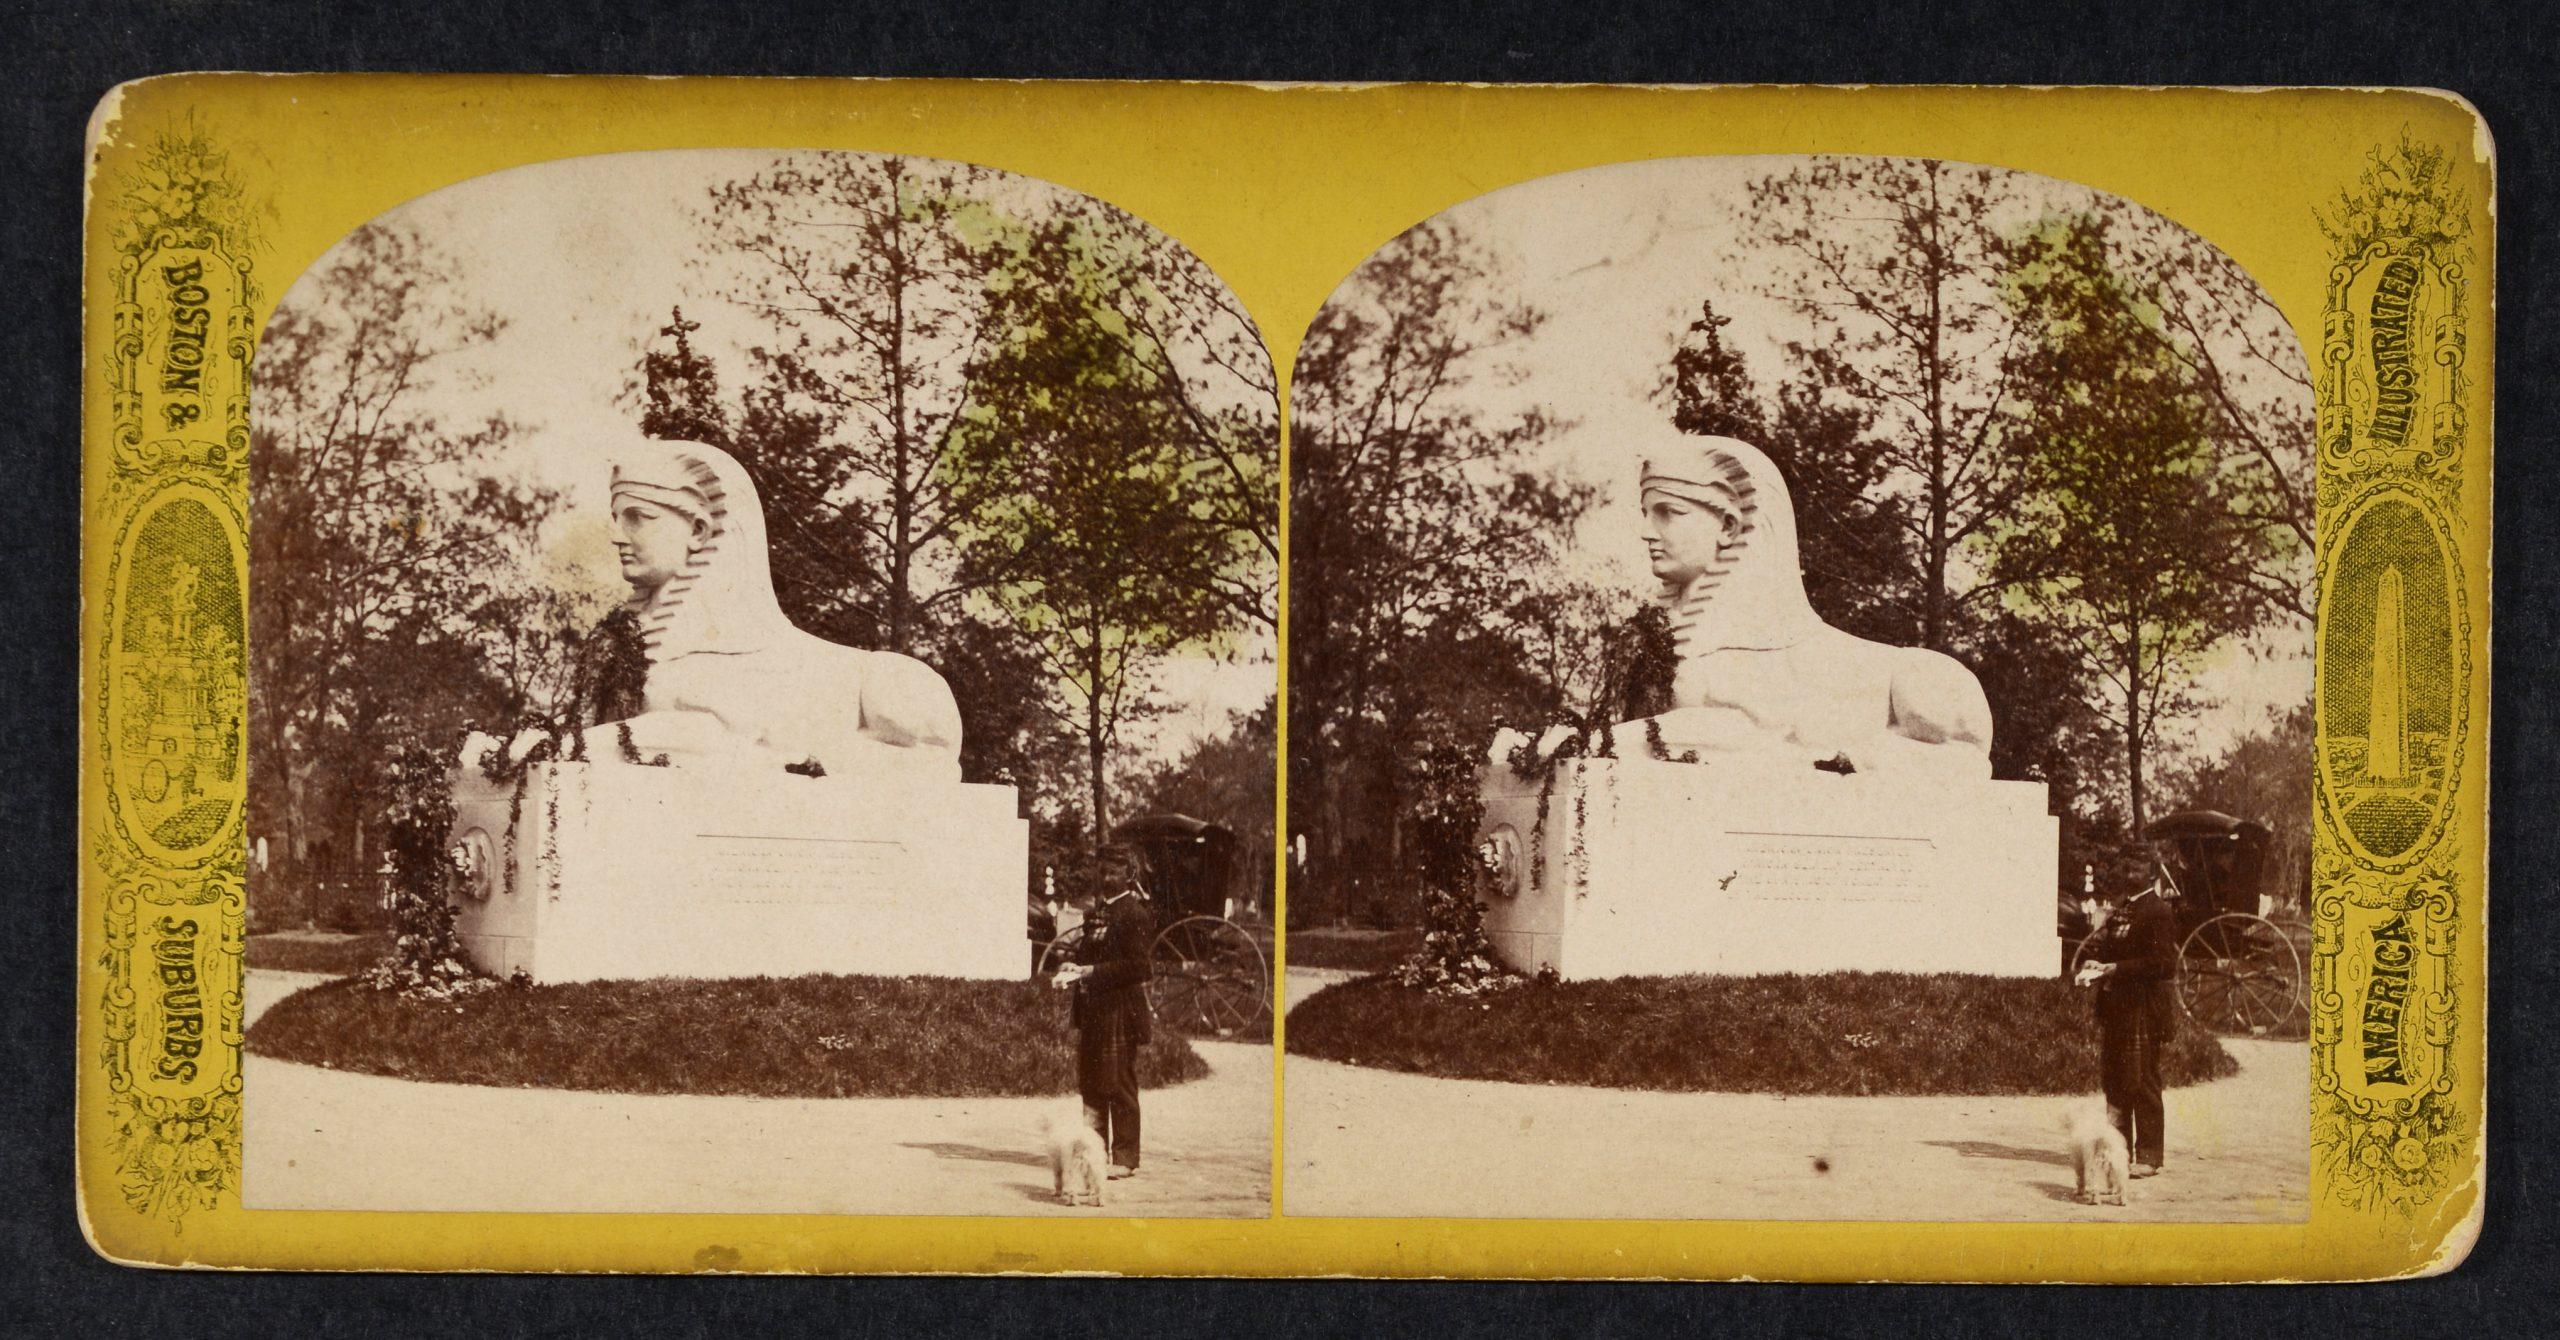 Stereoview of large granite sphinx sculpture, black civil war soldier, carriage.